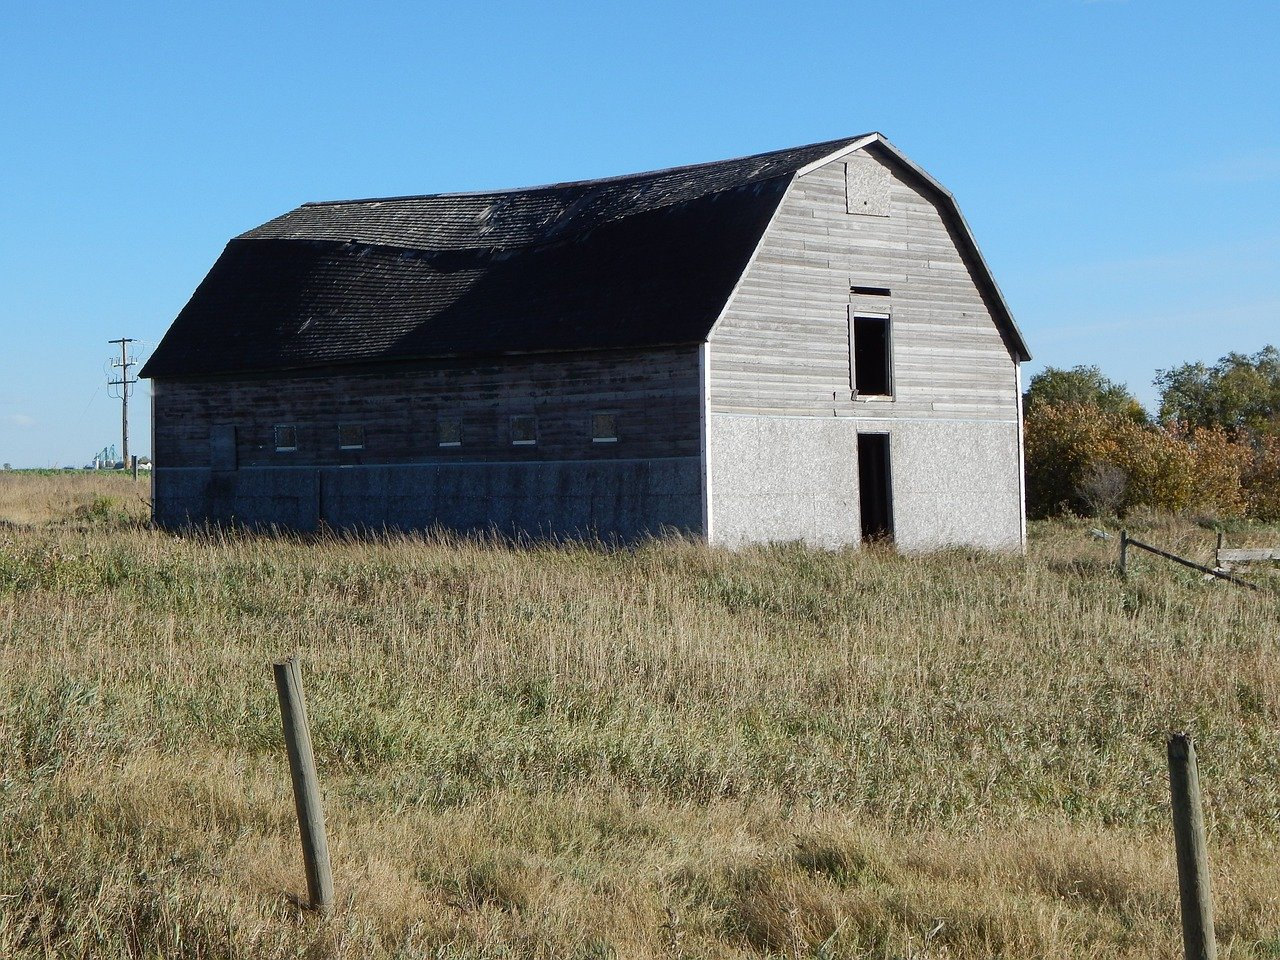 Photo of a barn atop a field of grass in rural Saskatchewan | Well Drilling